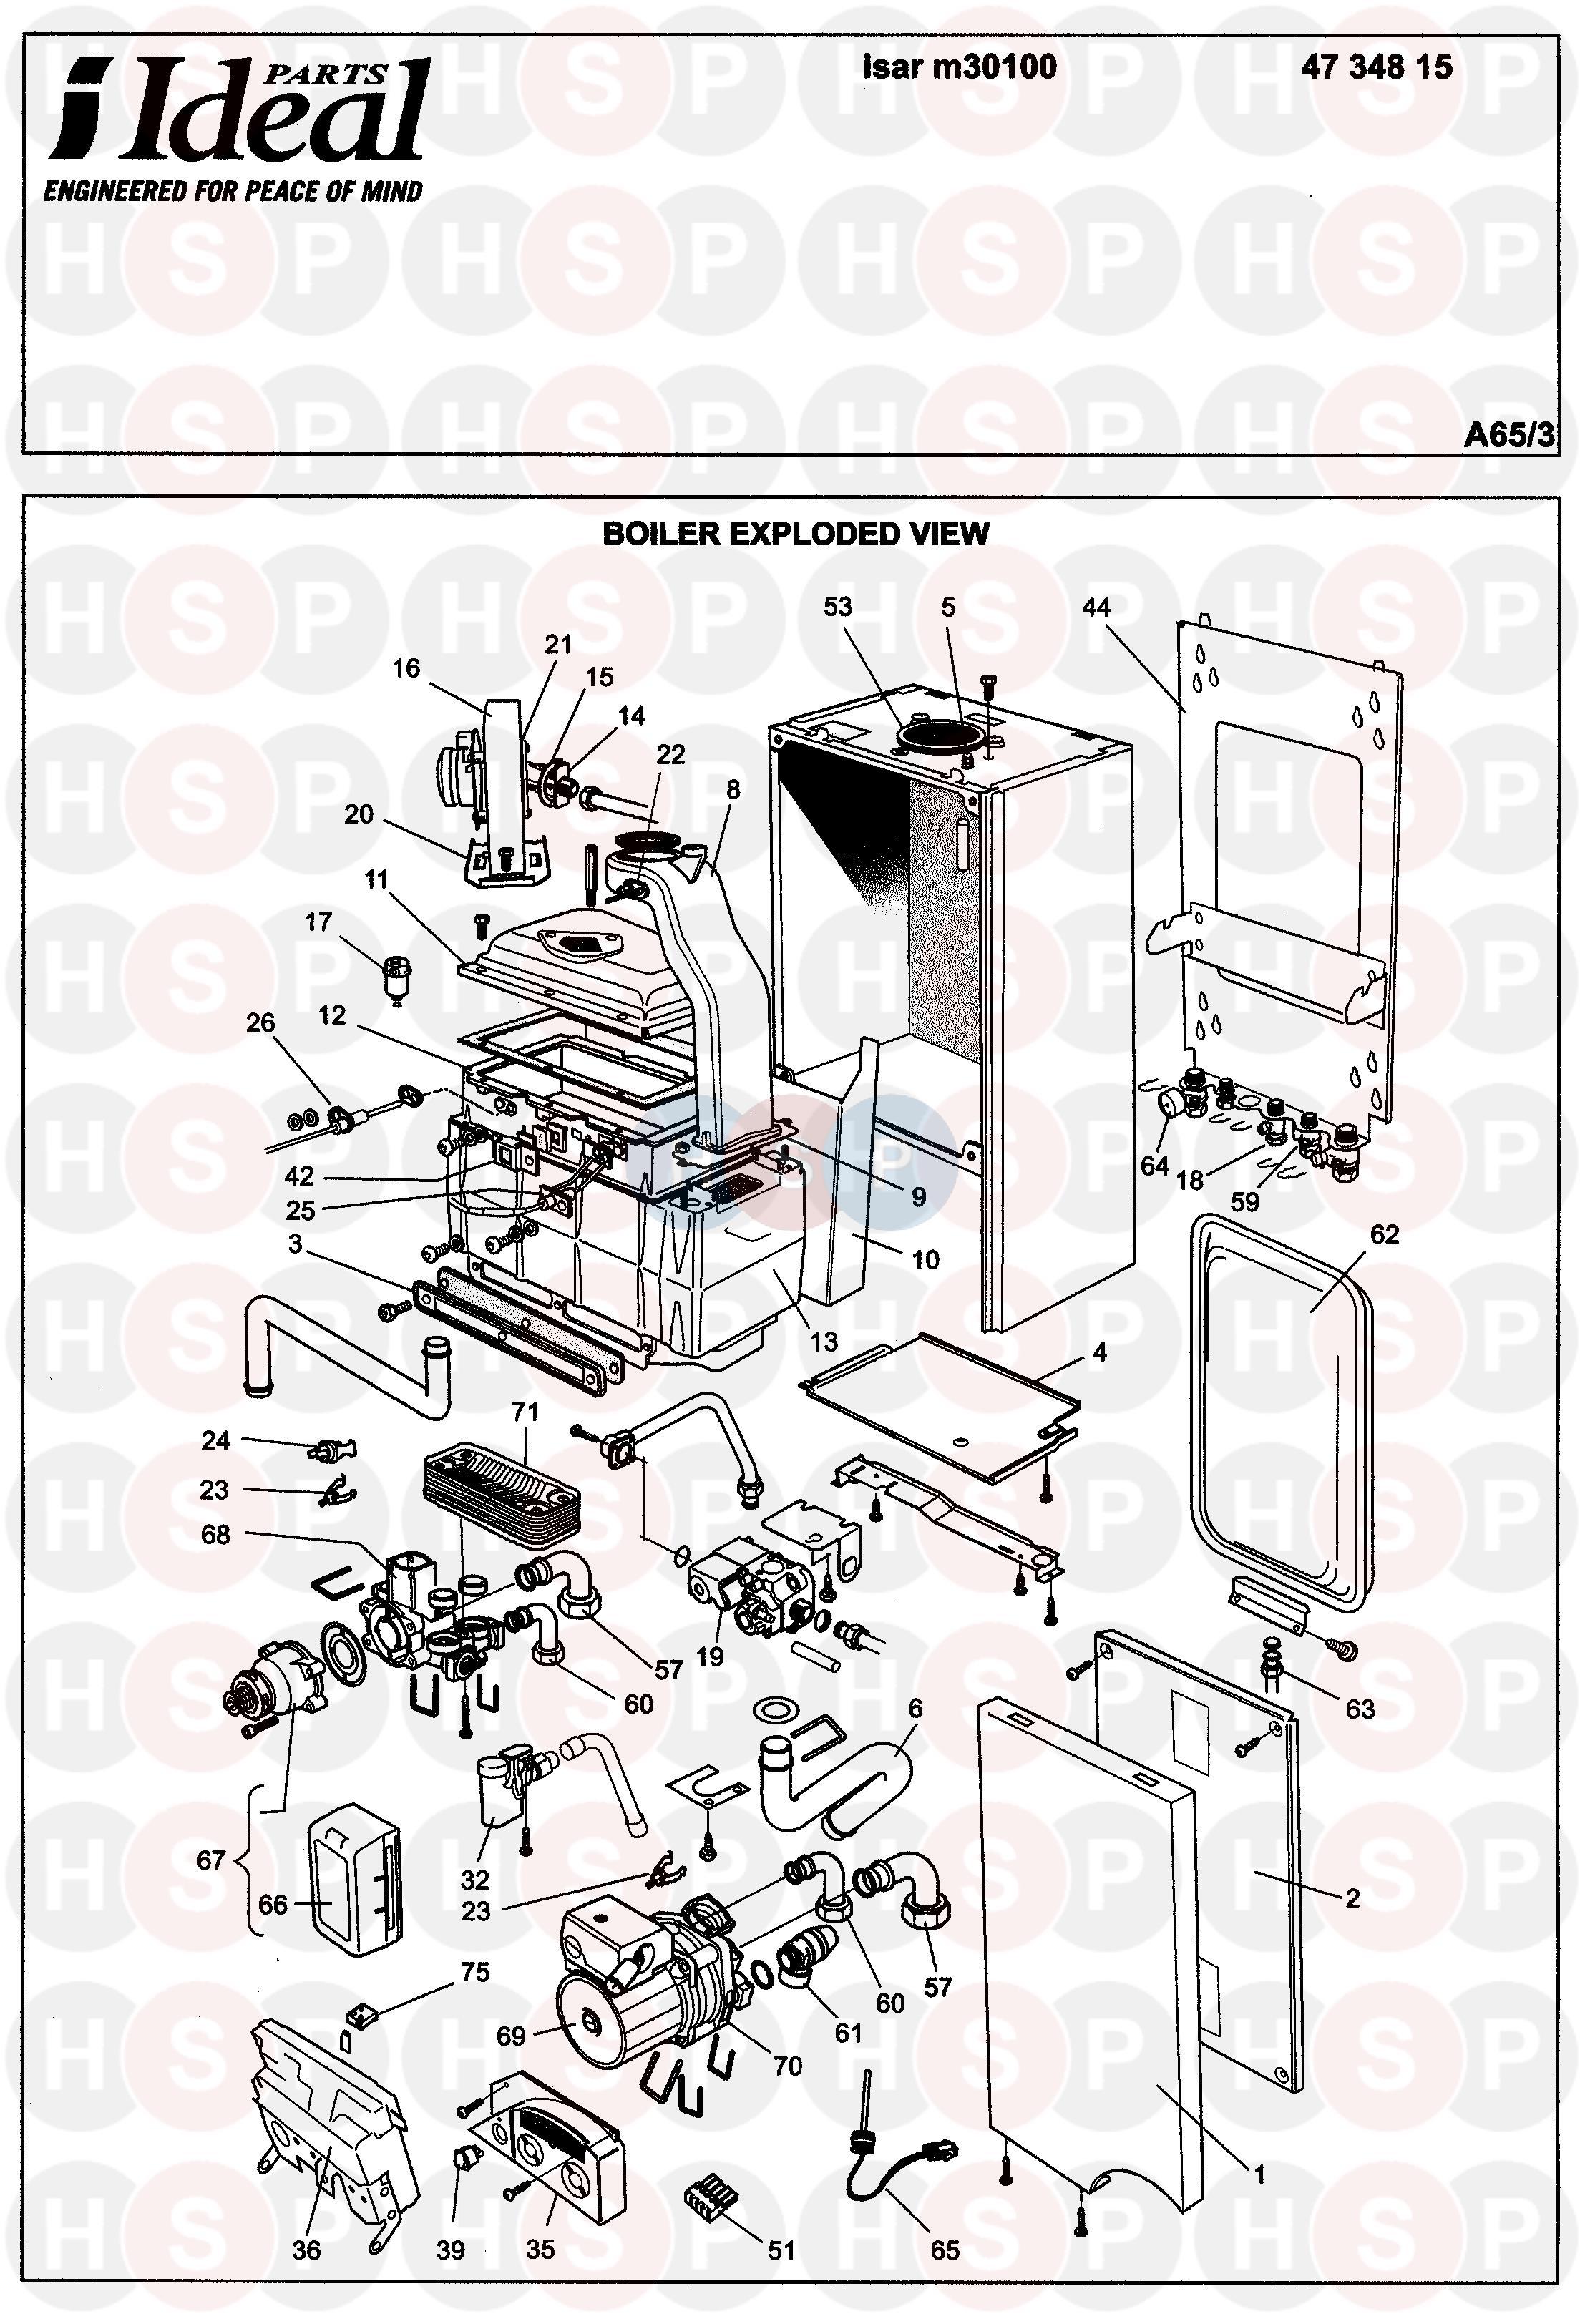 ideal isar m30100 appliance diagram  boiler